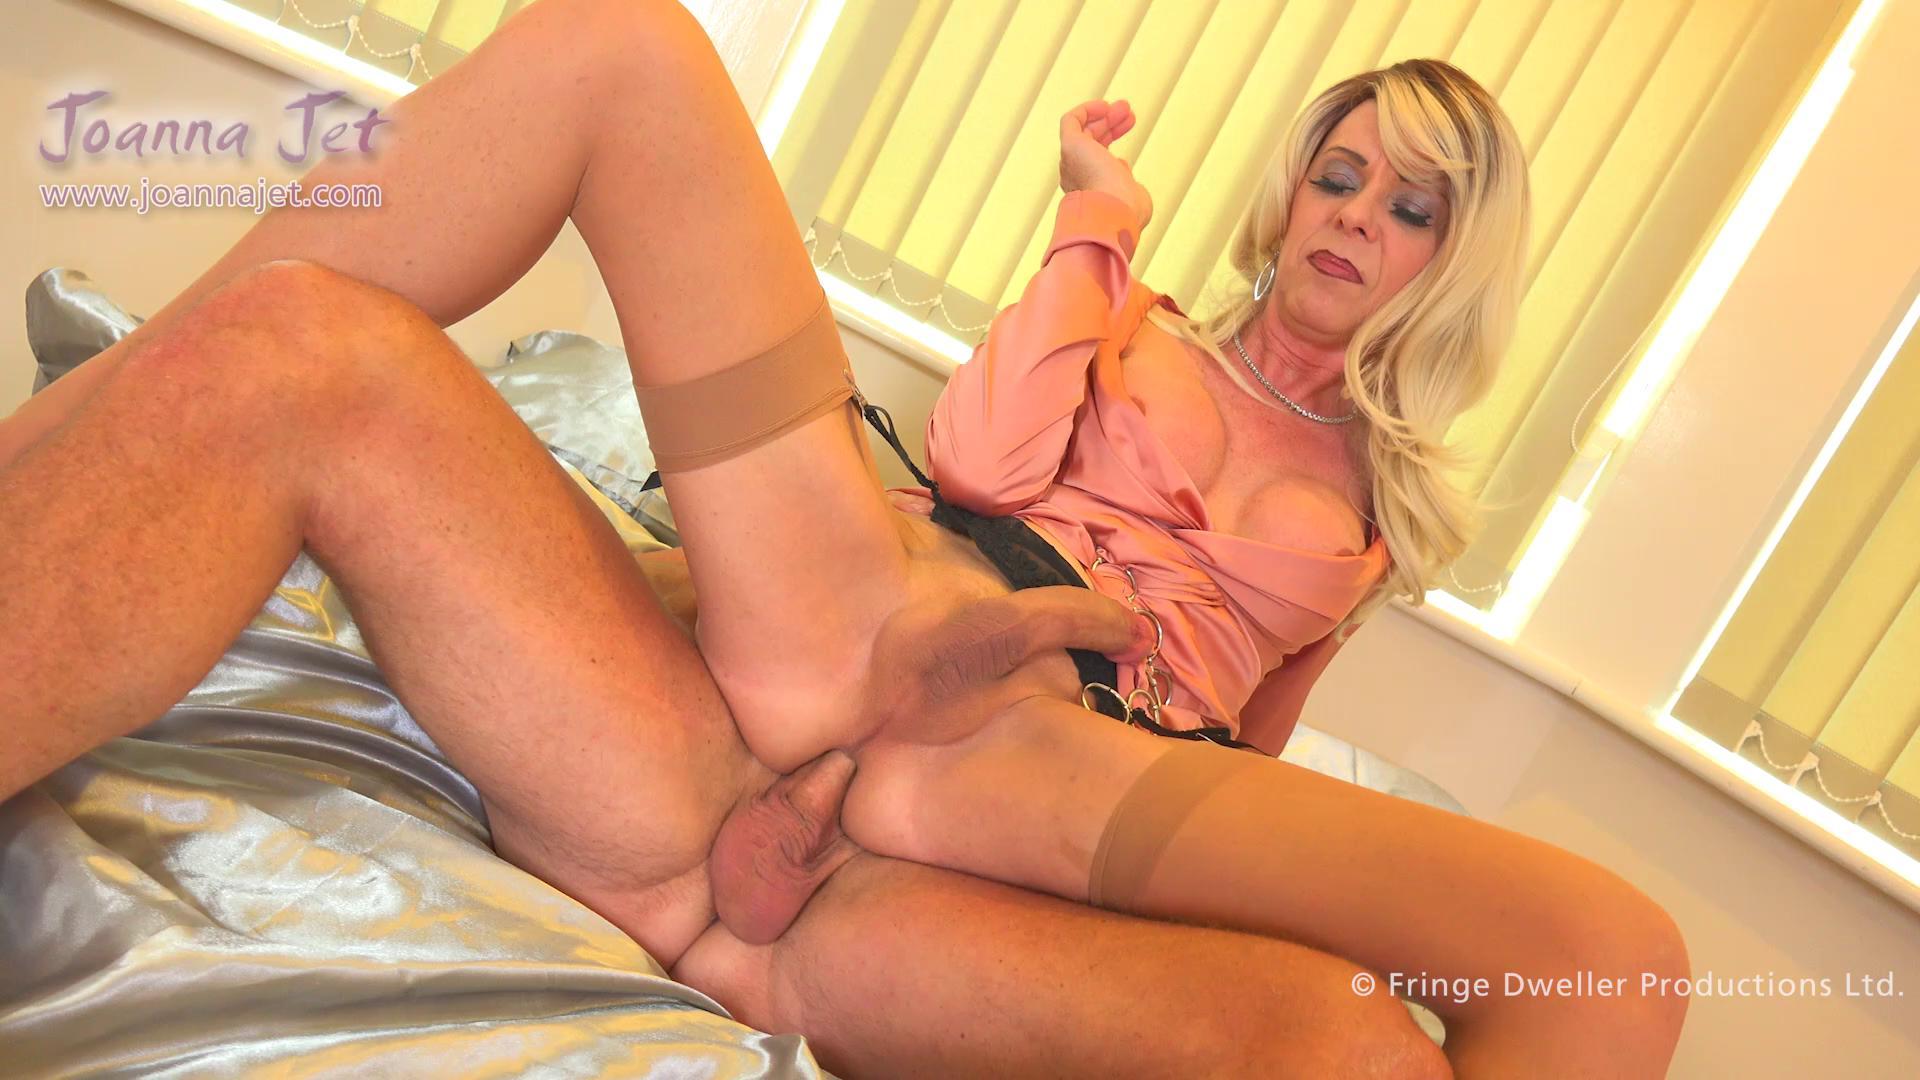 Classy Tranny Milf Joanna Jet Enjoys Passionate Foreplay And Sex